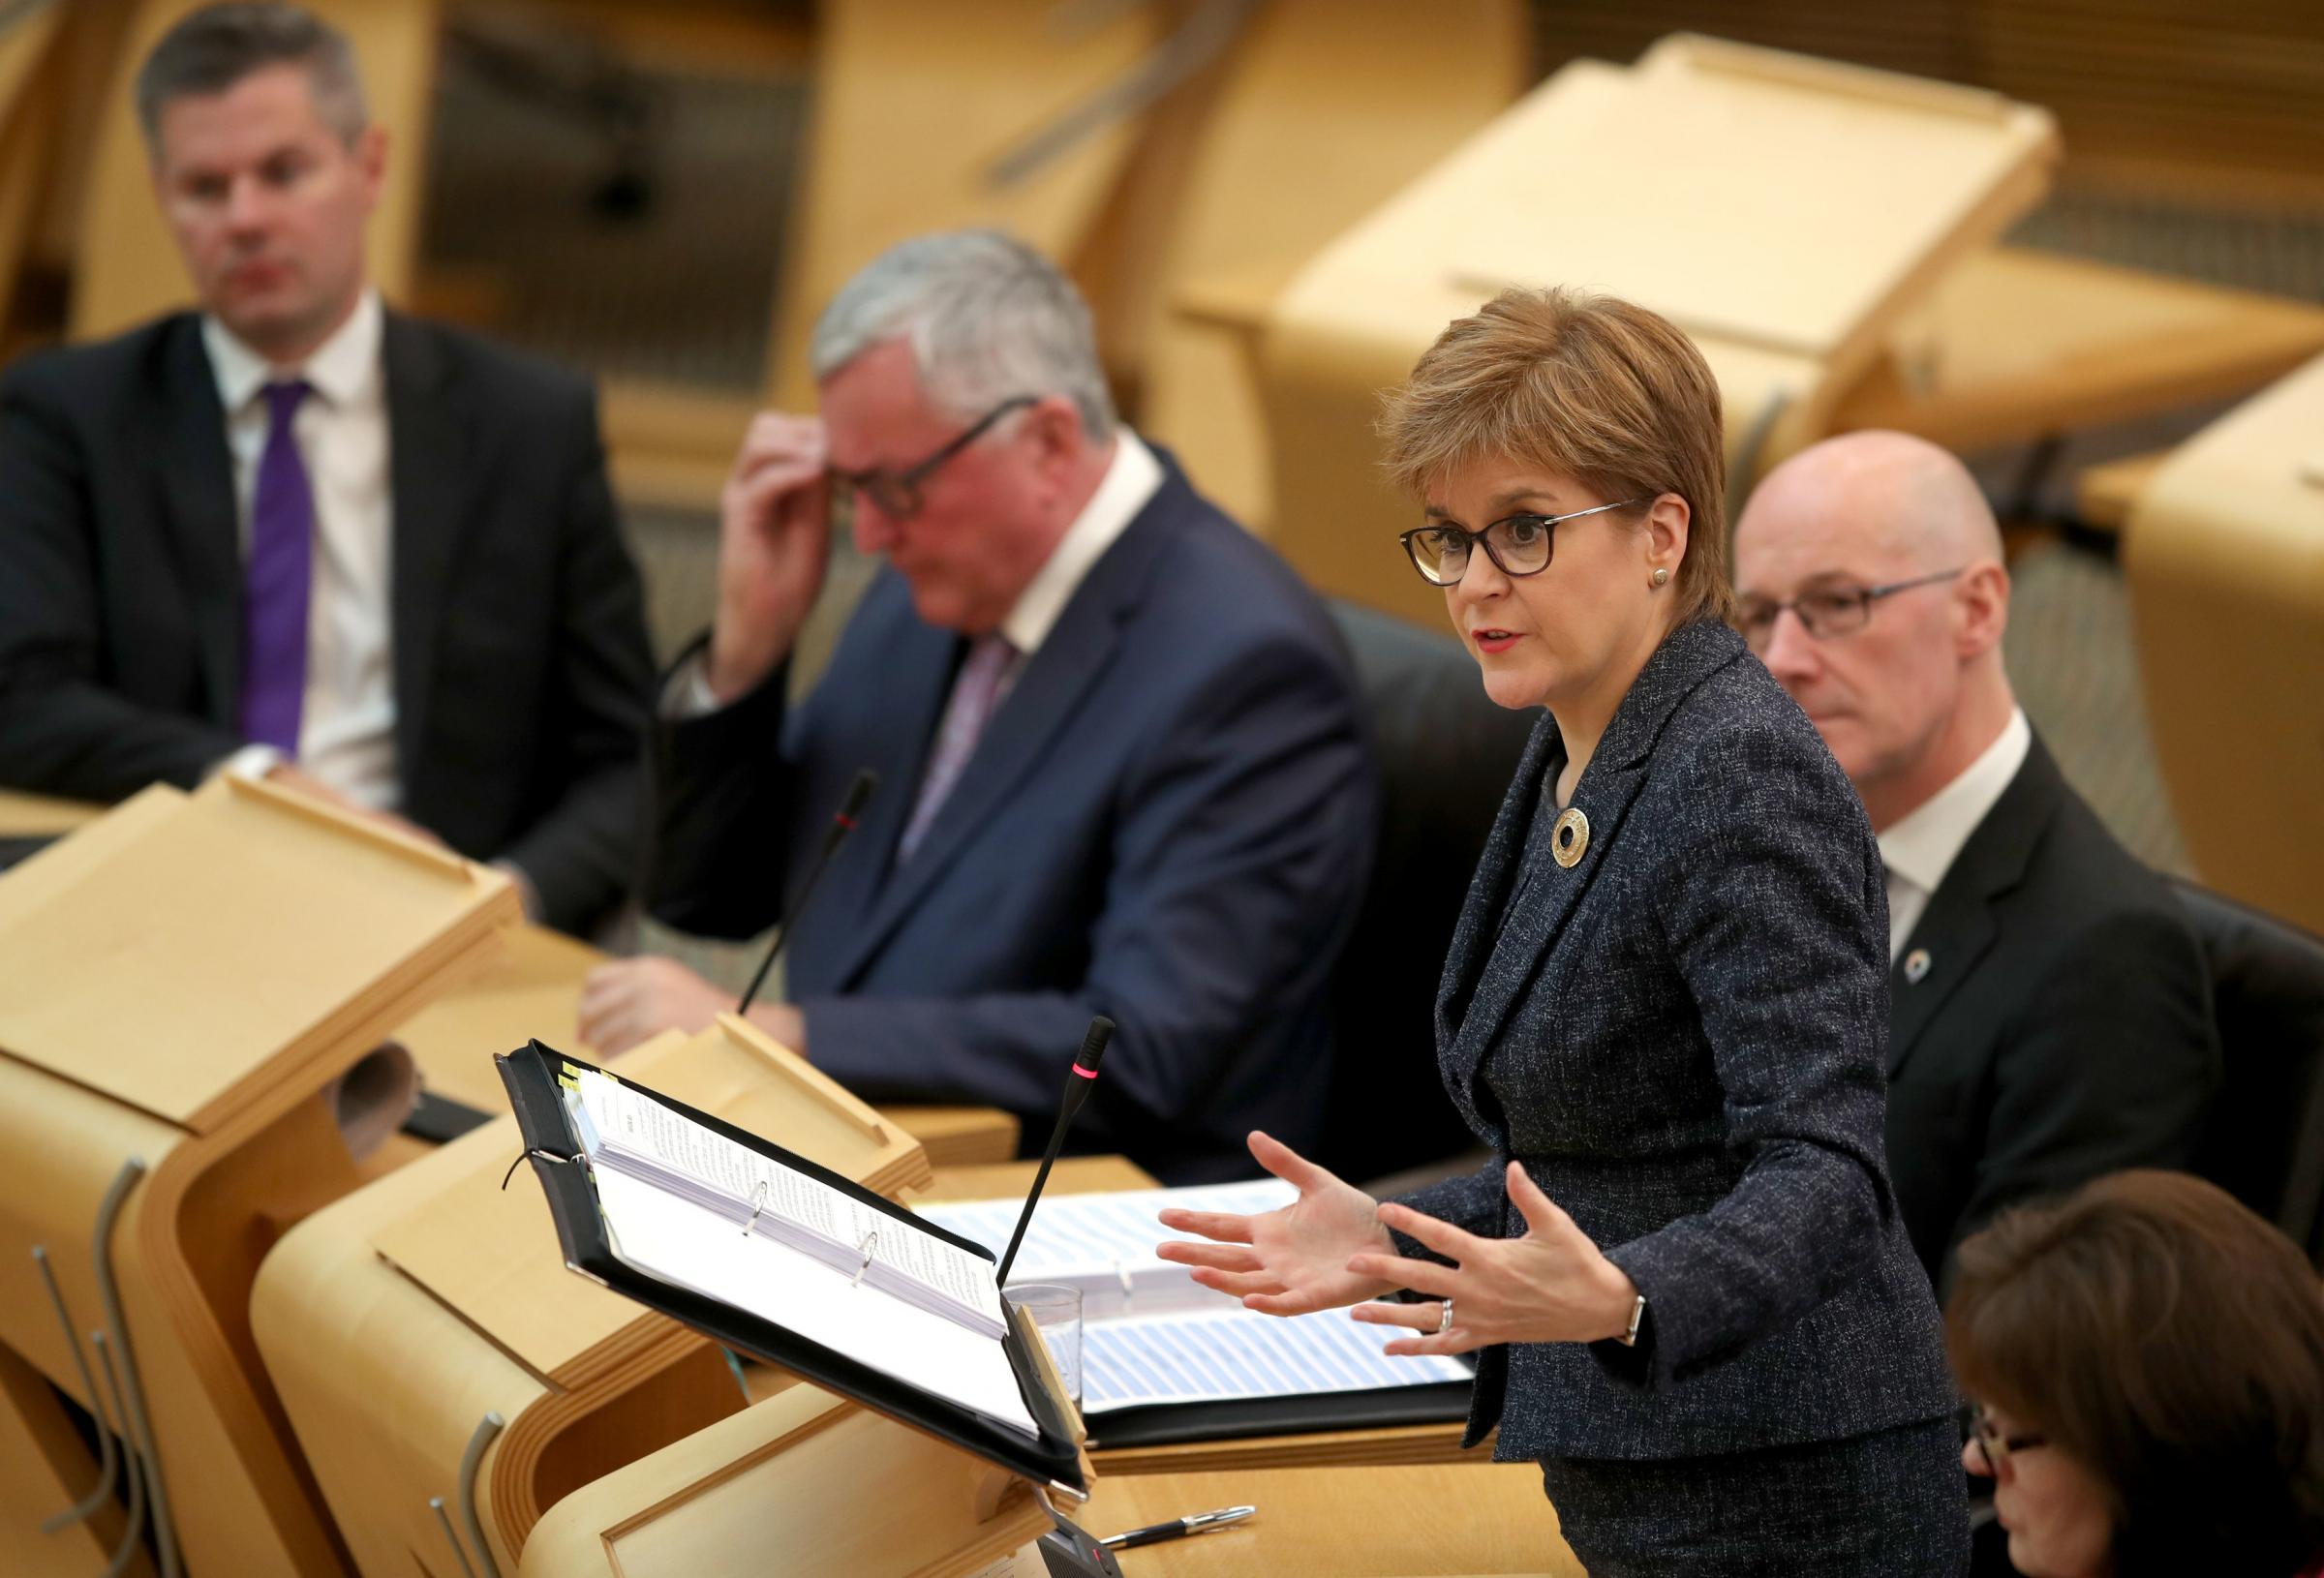 FM 'horrified' that asylum seeker lock-change evictions were found lawful